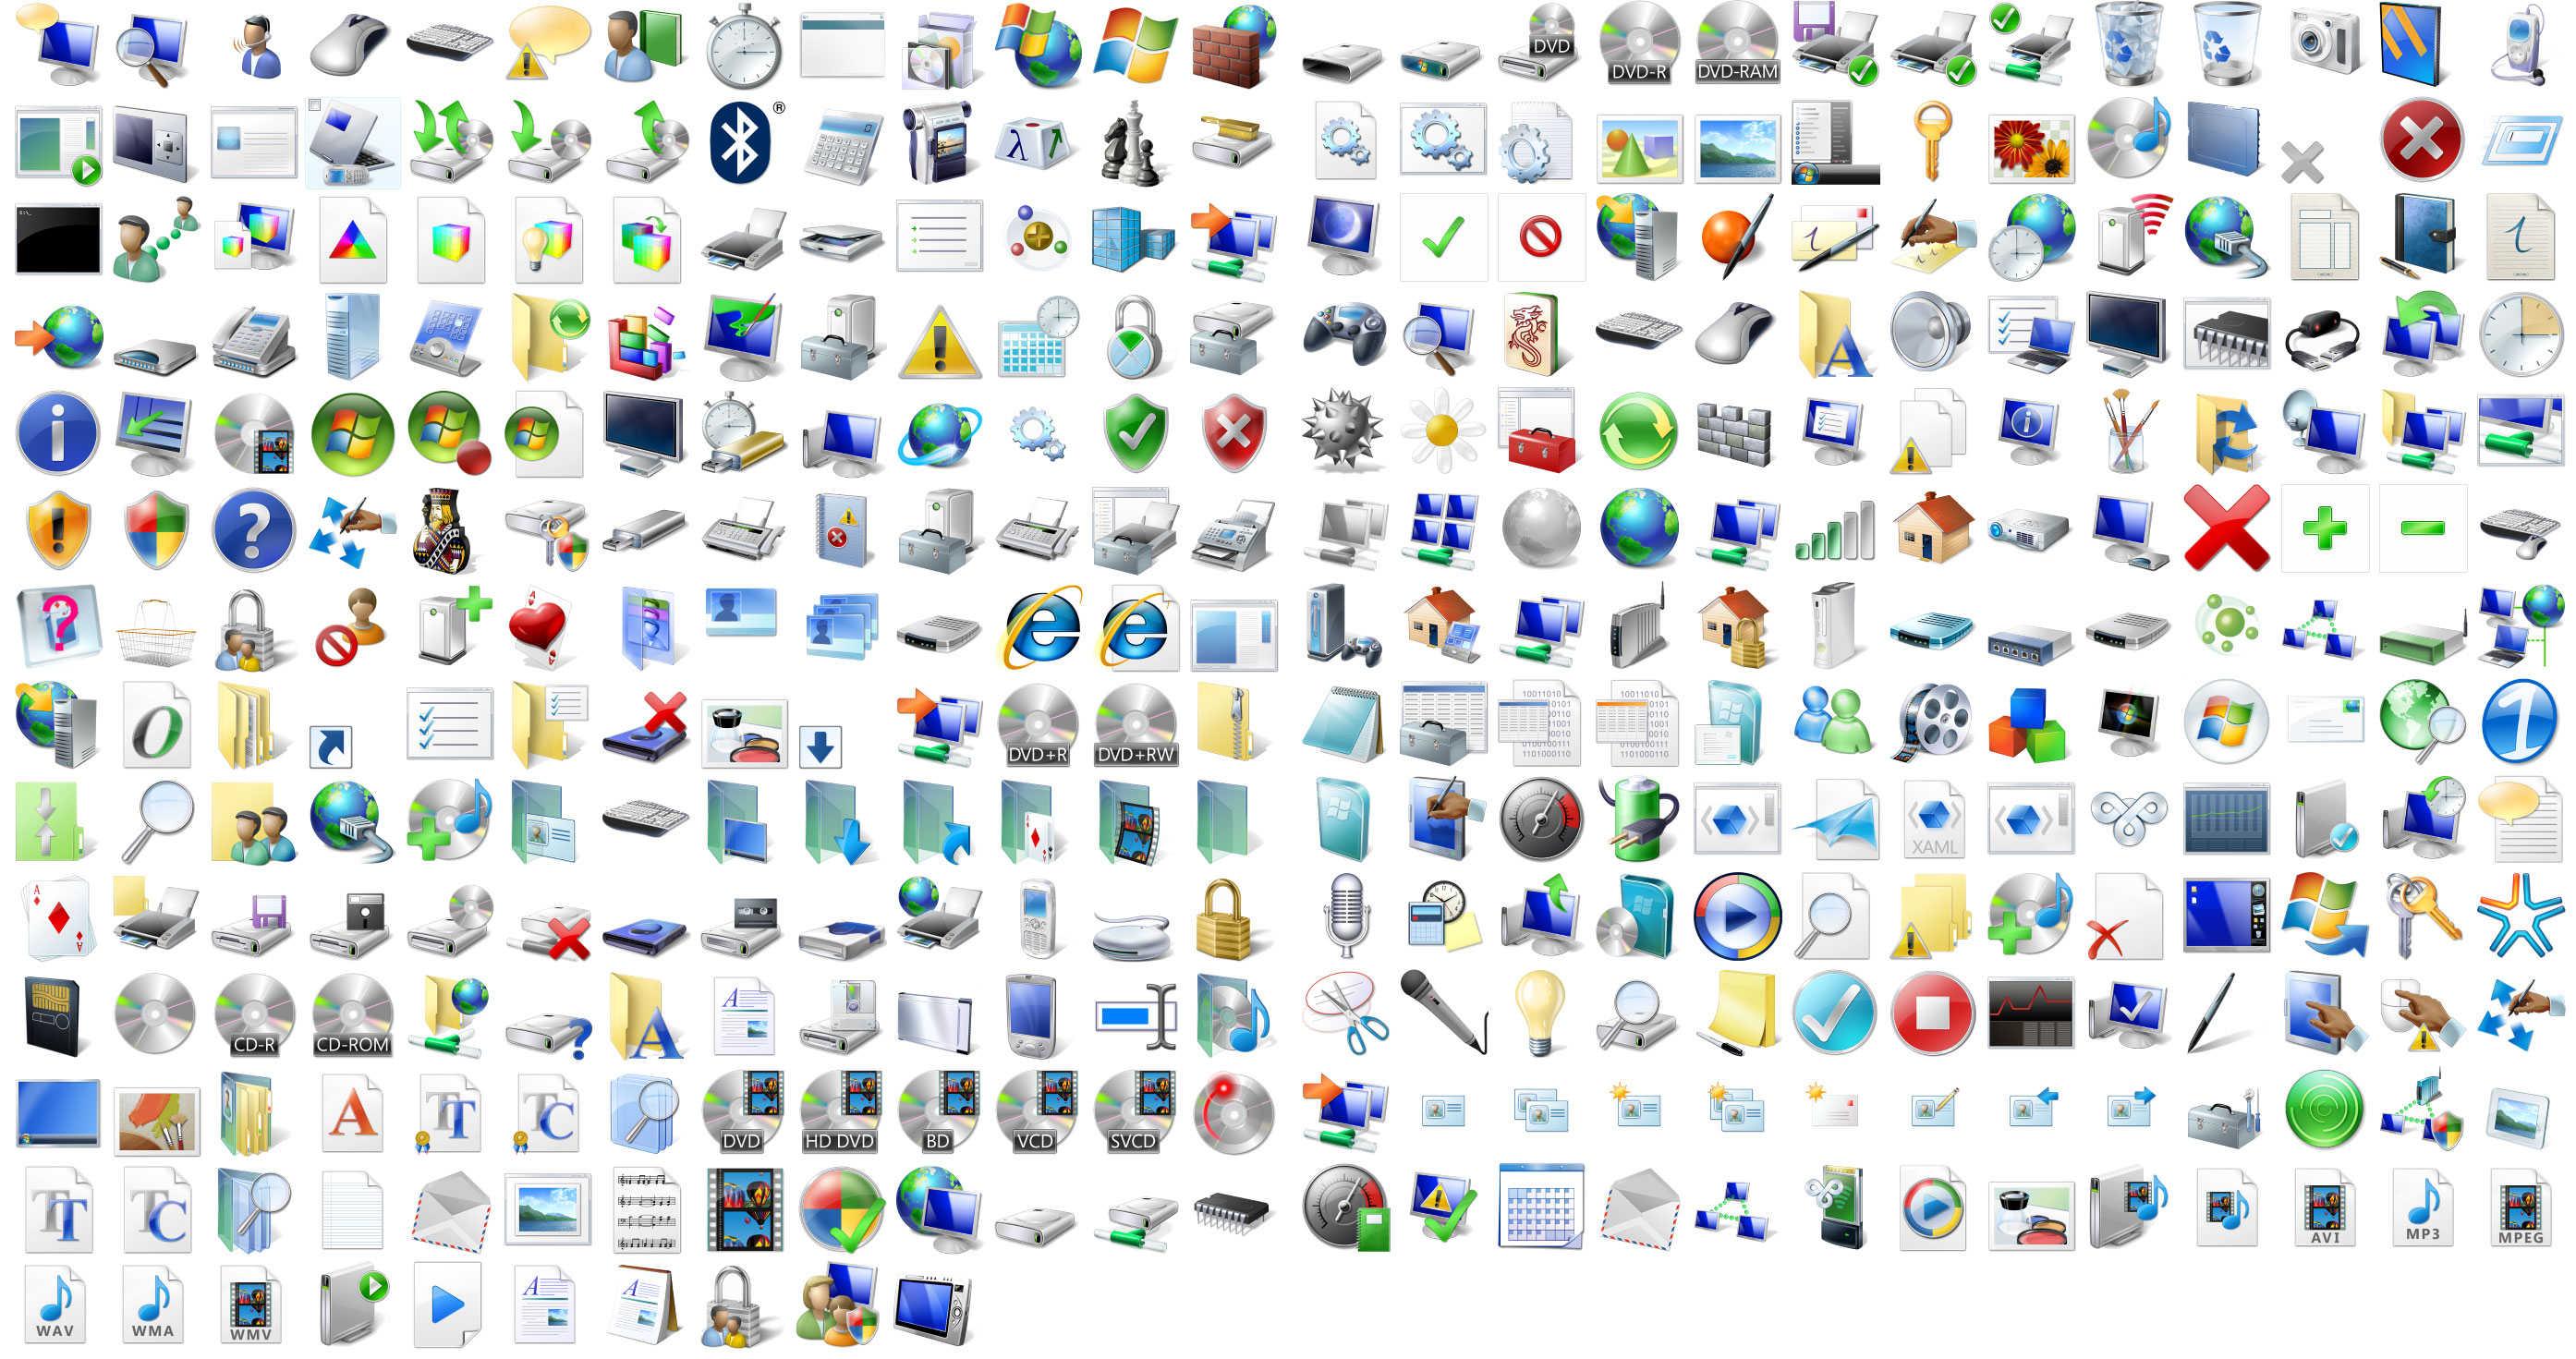 11 Download Windows 10 Icons Images - Custom Windows Icons Folder 10